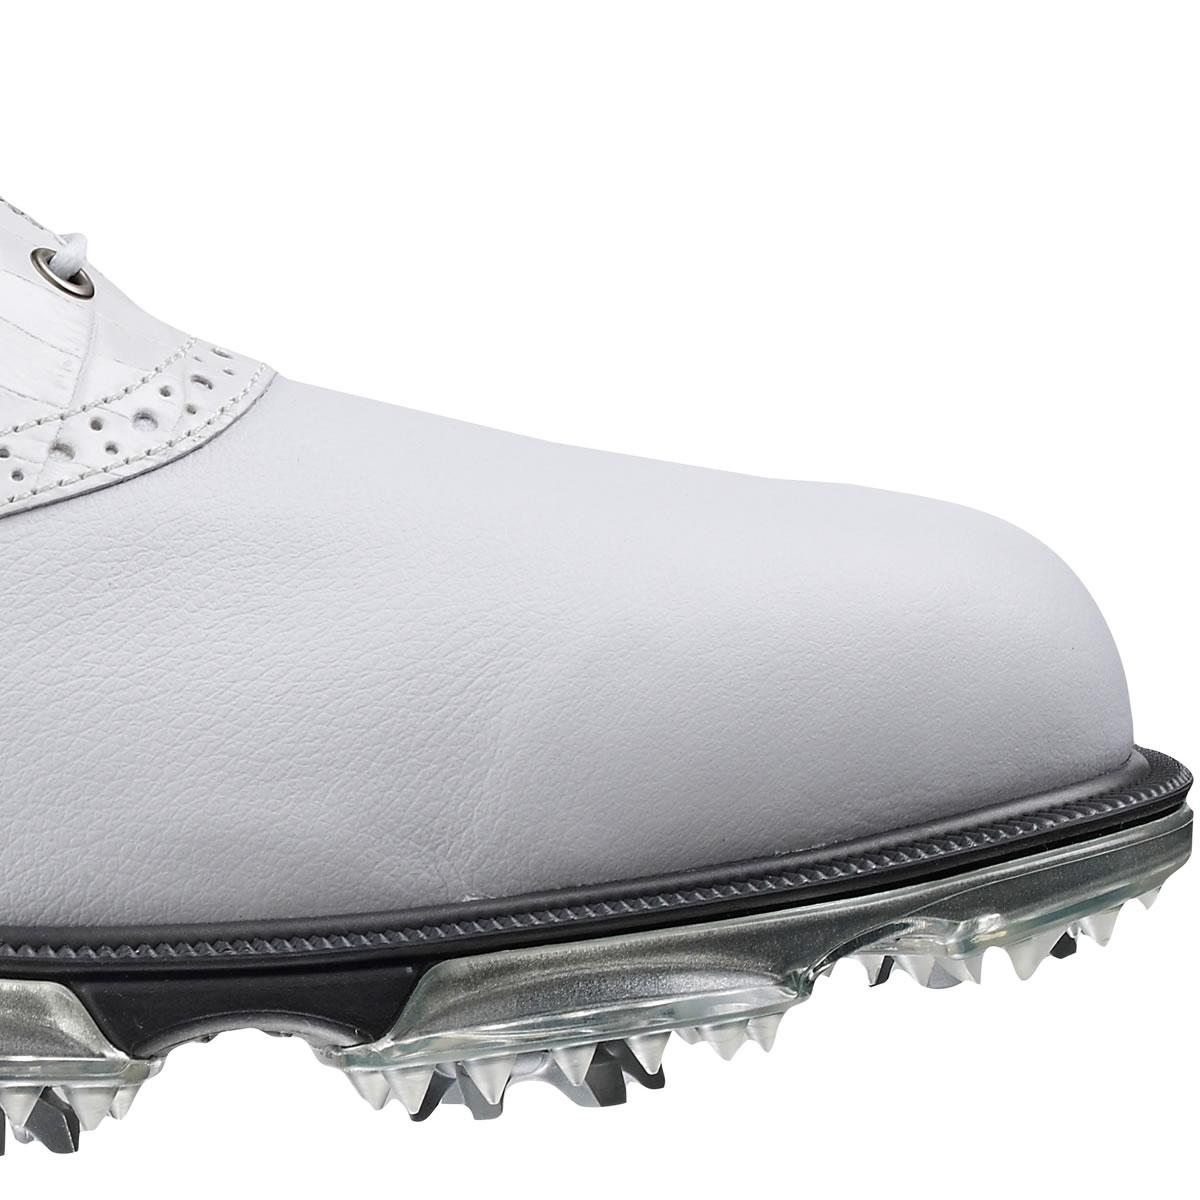 dryjoys tour golf shoes 53673 white white croc scottsdale golf